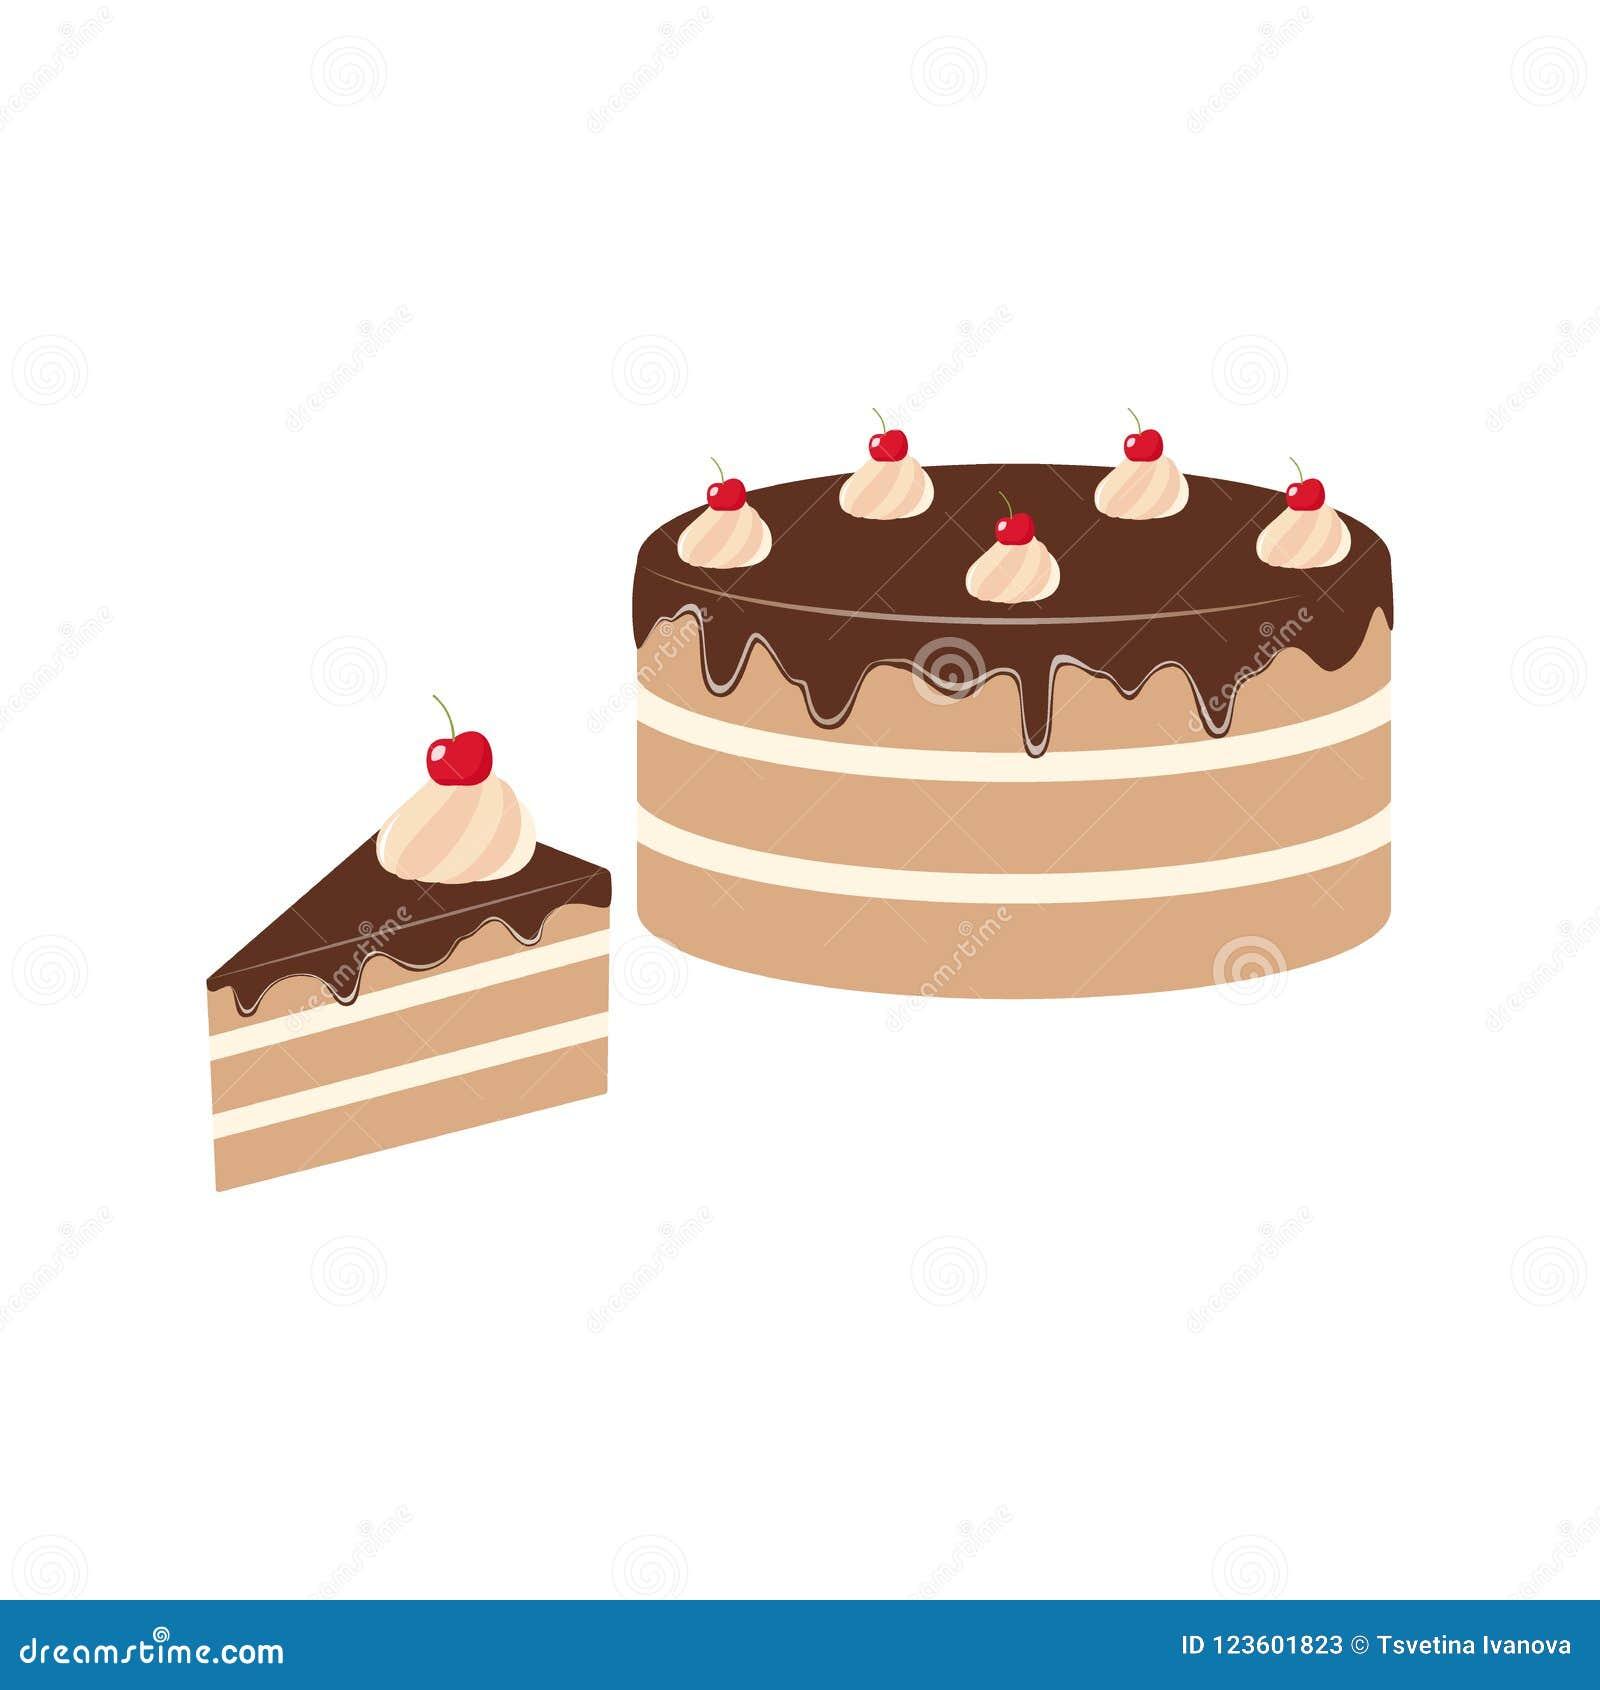 Chocolate Cake Clipart Cartoon Chocolate Cake And A Piece Of Cake